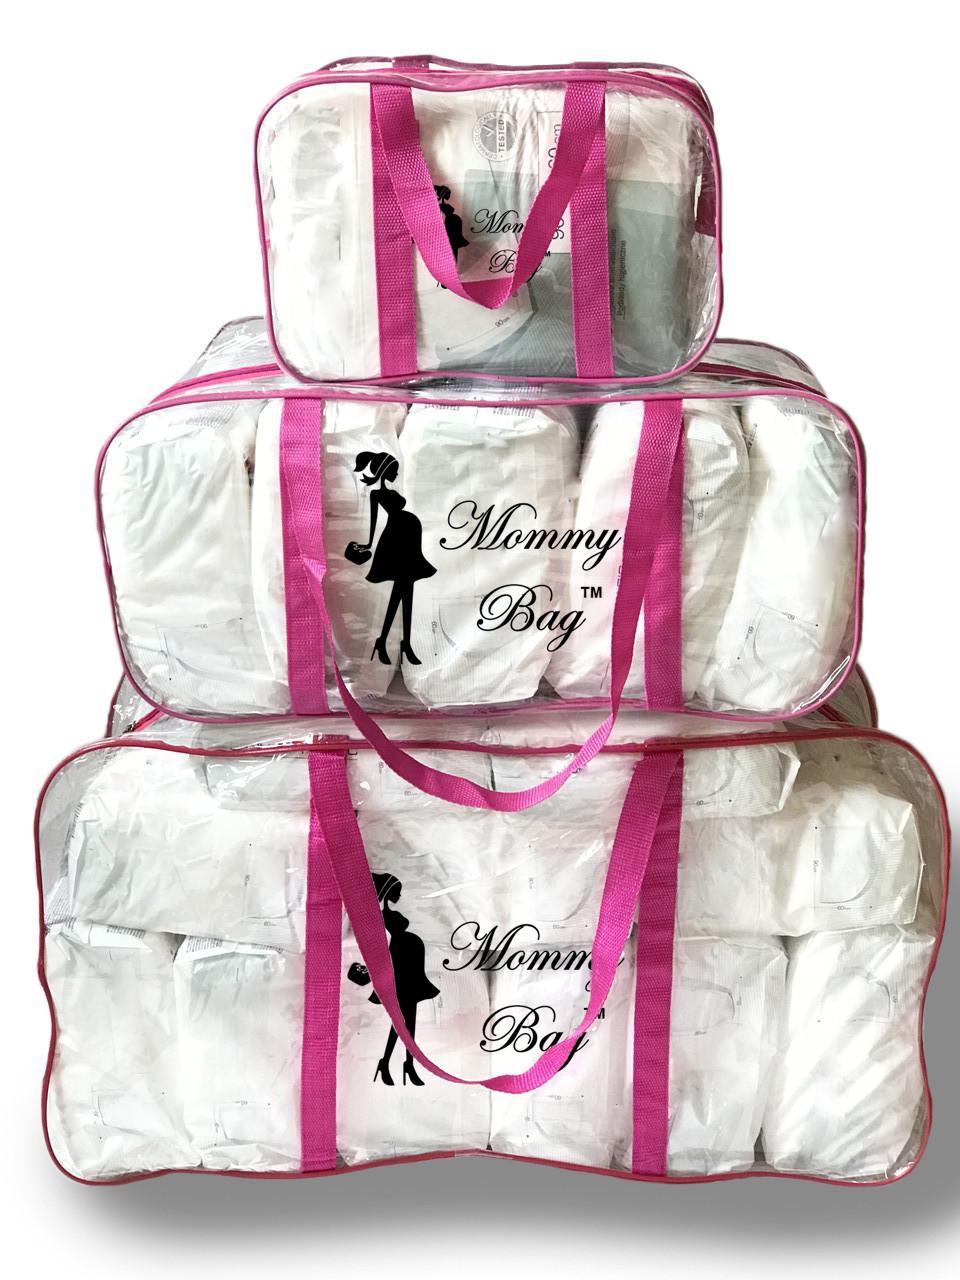 676bf5c92b5e Набор из 3 прозрачных сумок в роддом Mommy Bag - S,L,XL - Розовые ...